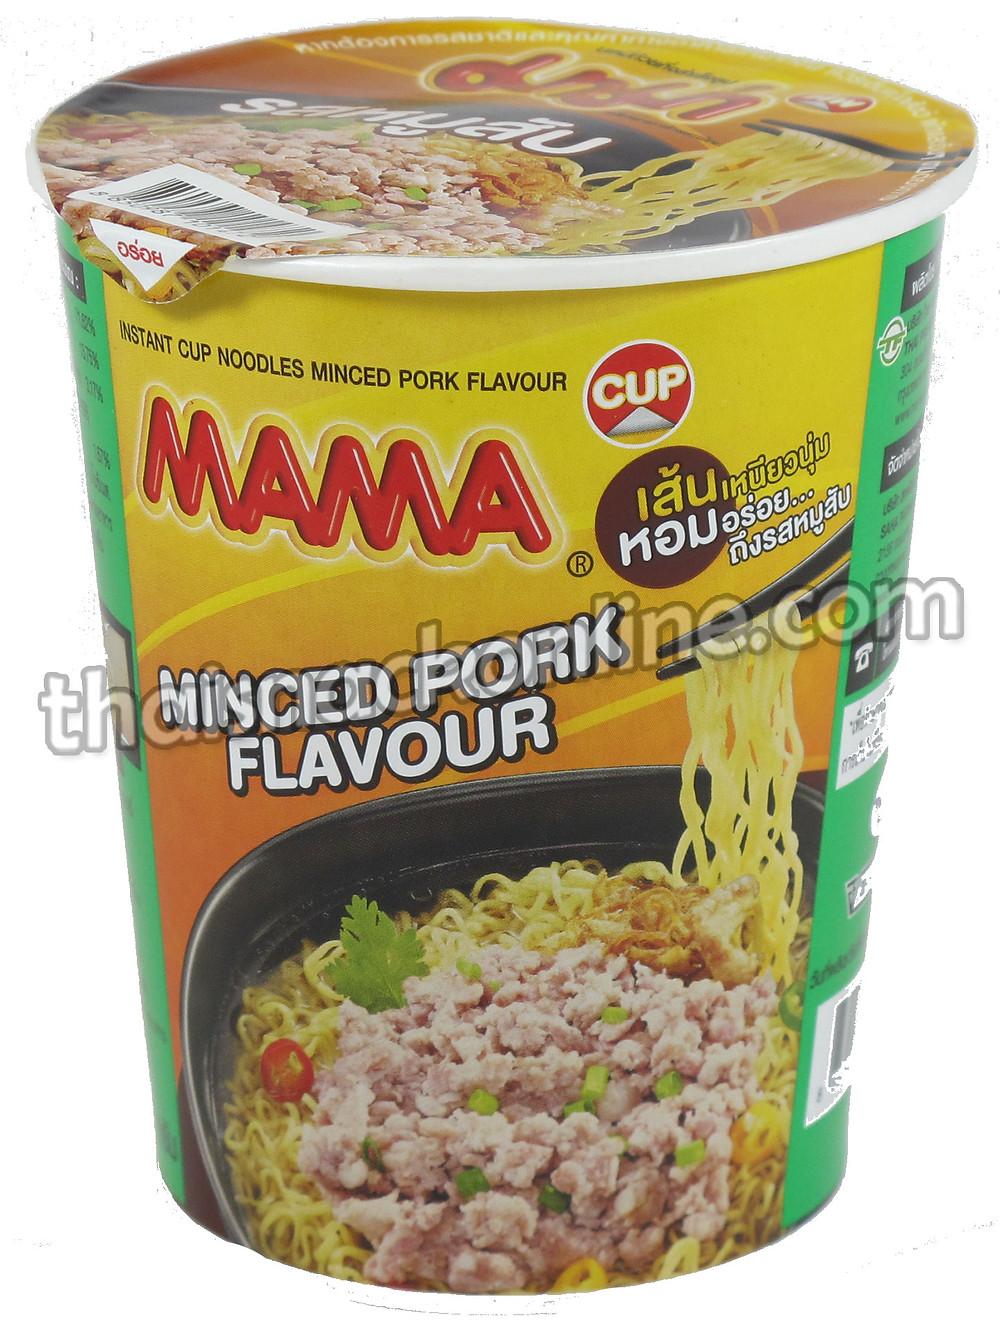 Mama Cup - Minced pork (60g)